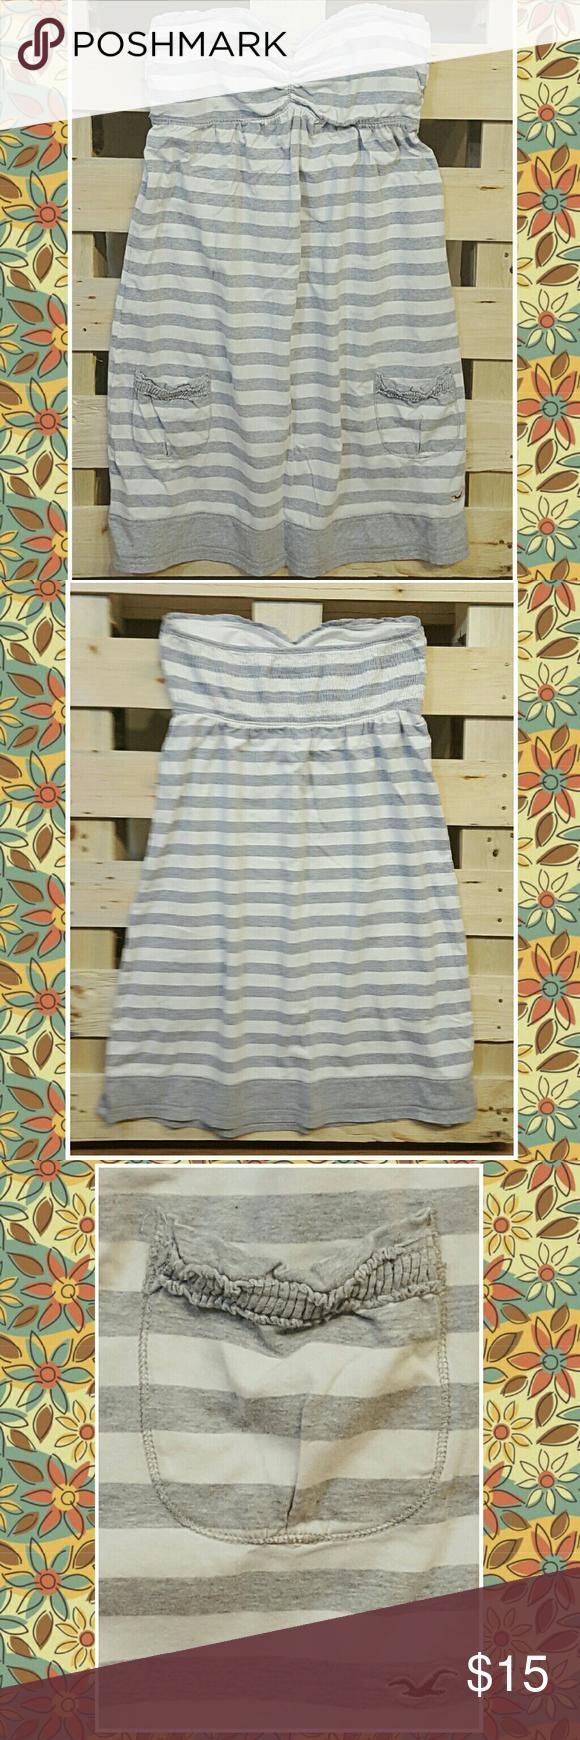 Hollister Sundress Adorable gray an white striped Sundress. Hollister Dresses